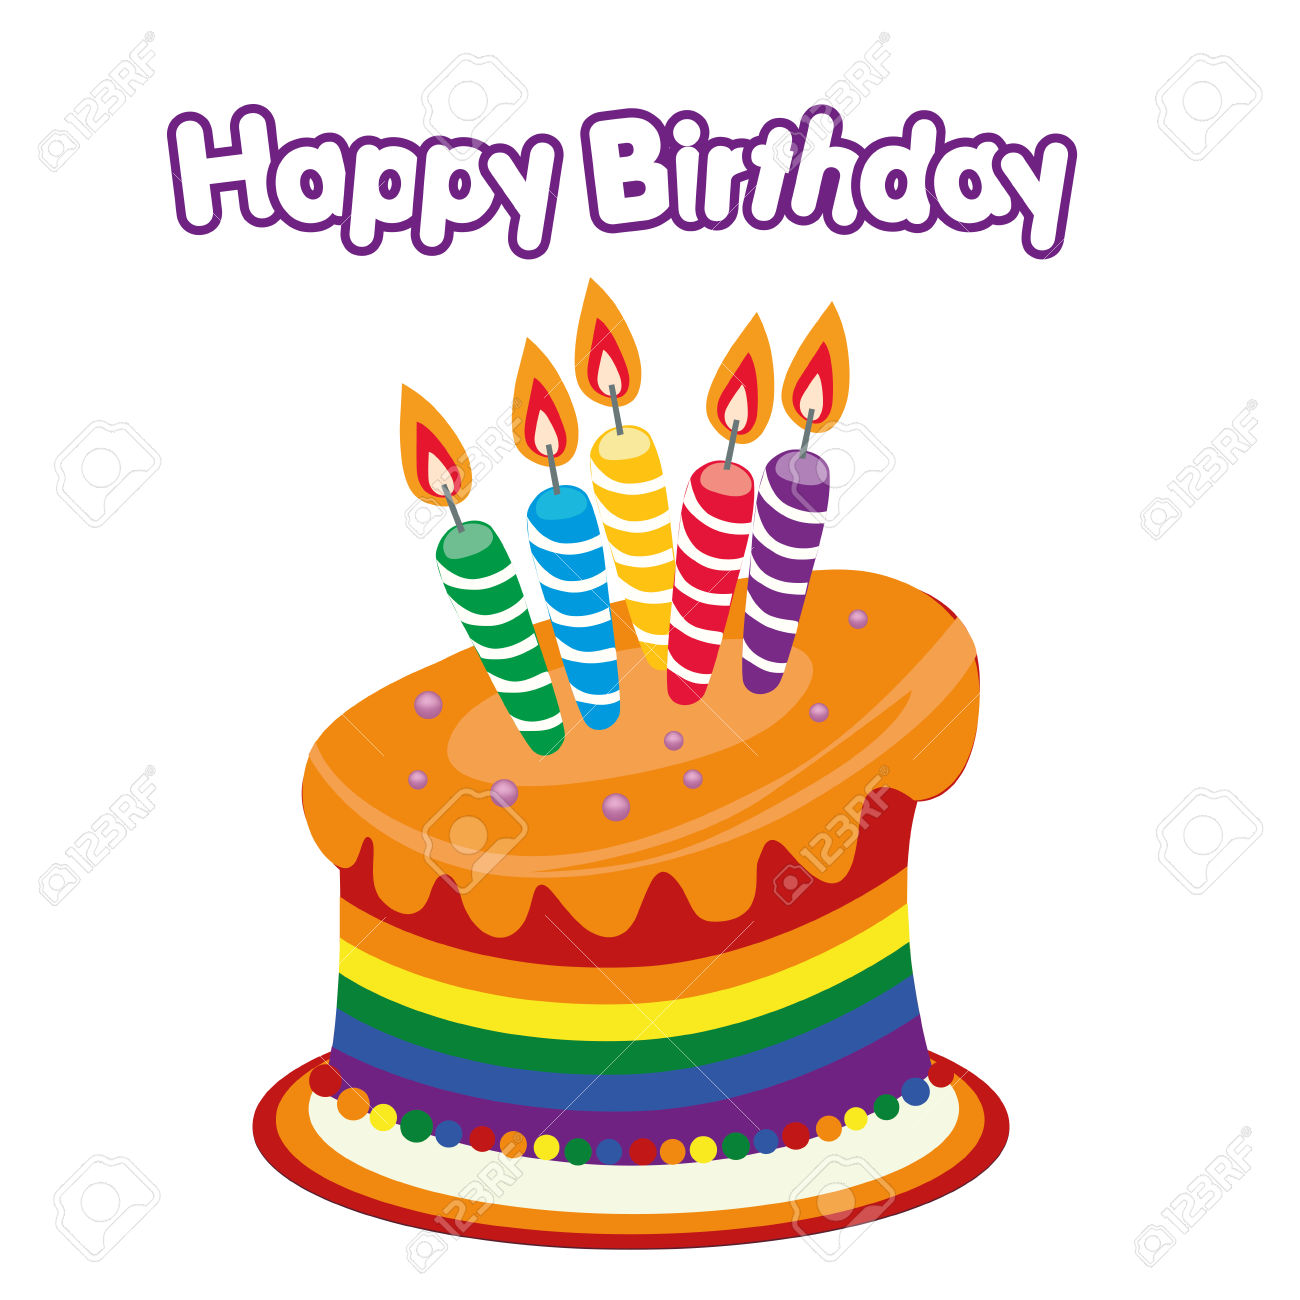 Clipart happy birthday cake vector royalty free stock Happy Birthday Cake Clipart a Colored Happy Birthday Cake ... vector royalty free stock